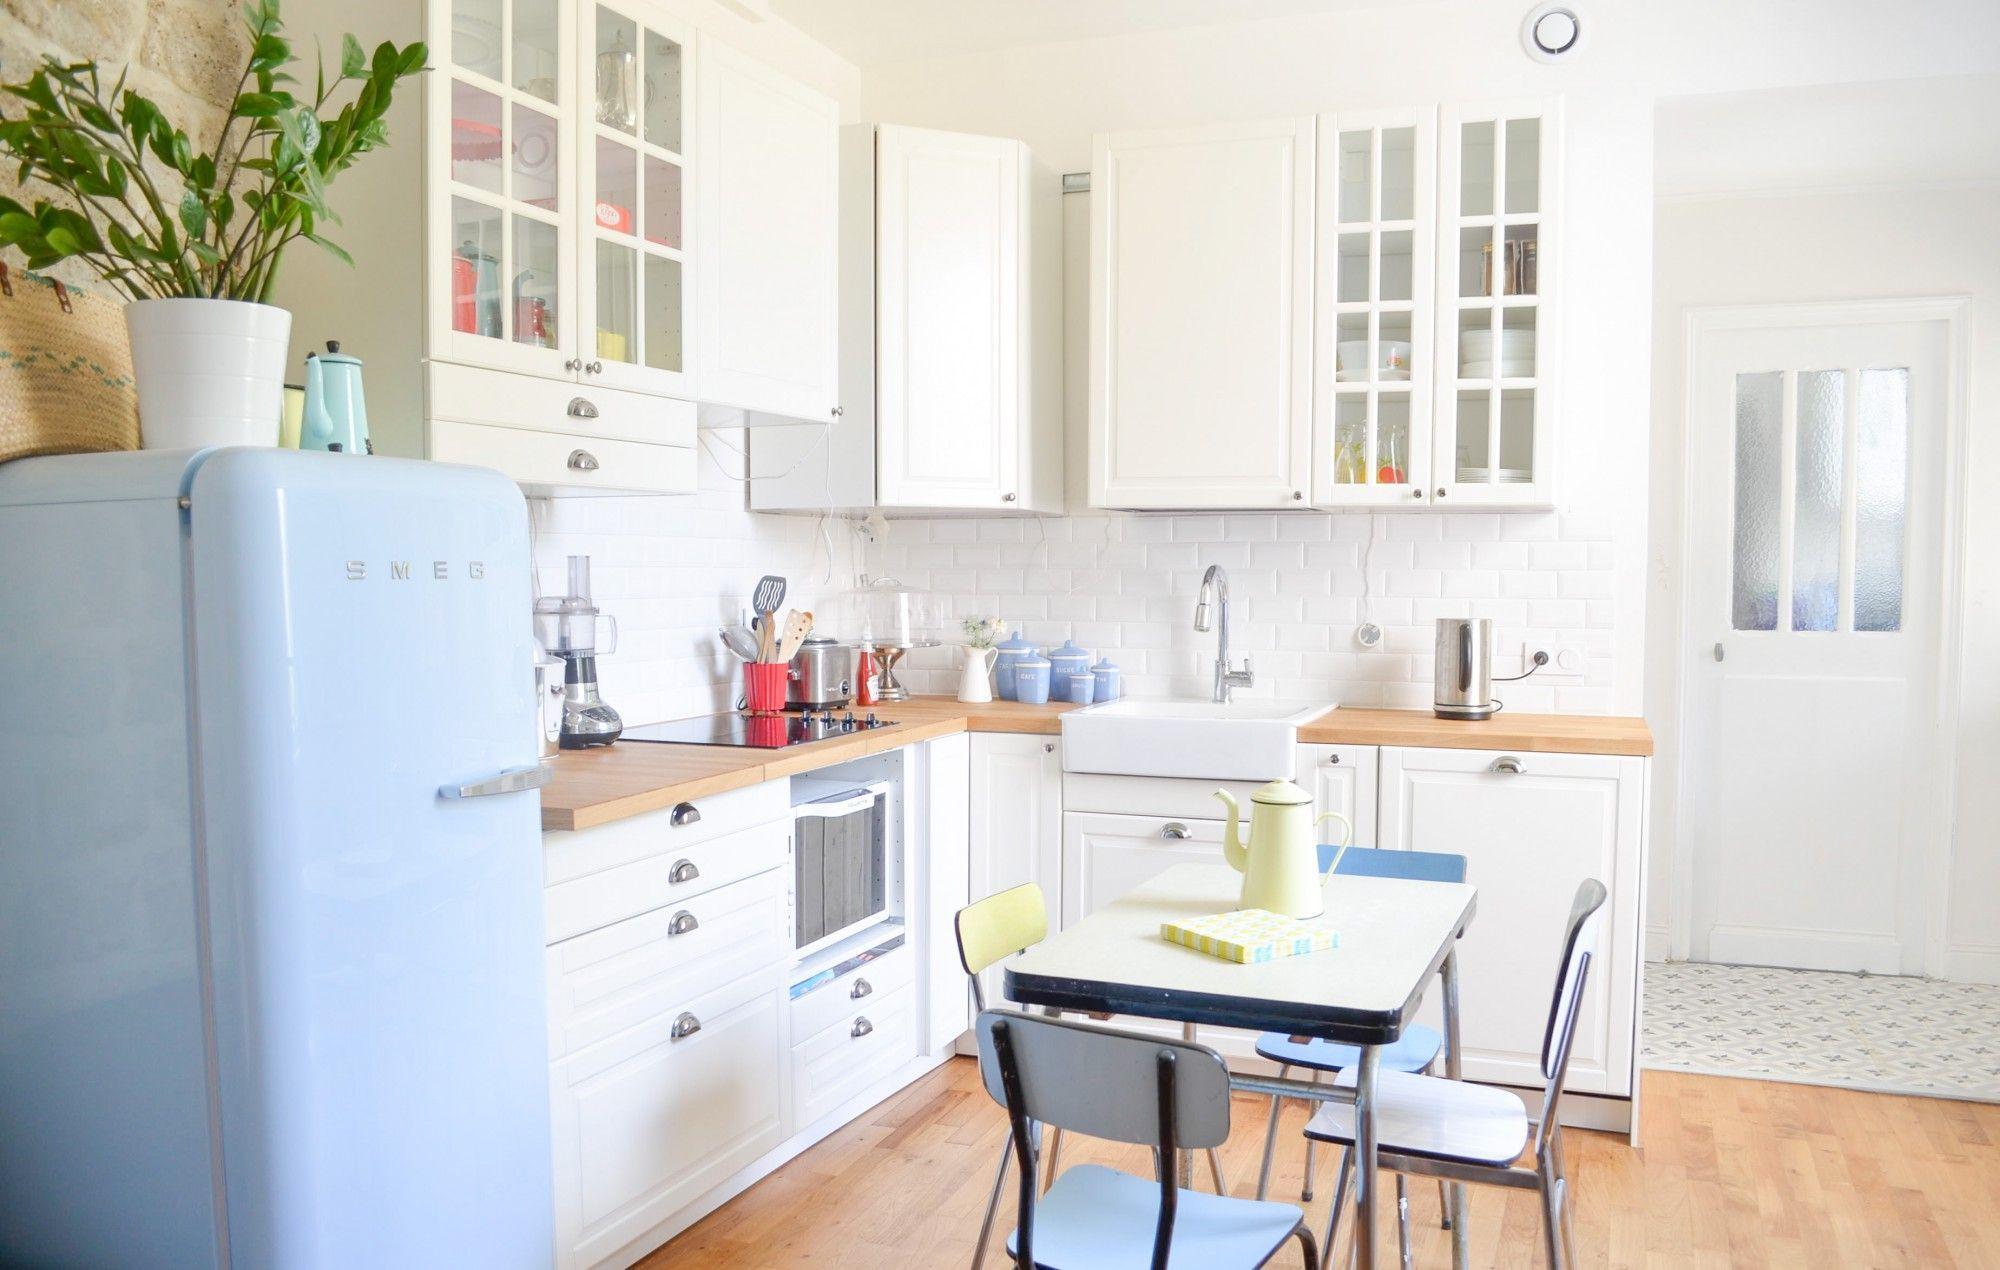 Cuisine Ikea Metod Bodbyn Montage Smeg Bleu Ciel Placard D Angle Egouttoir Formica Kitchen Design Decor Kitchen Decor Country Kitchen Decor